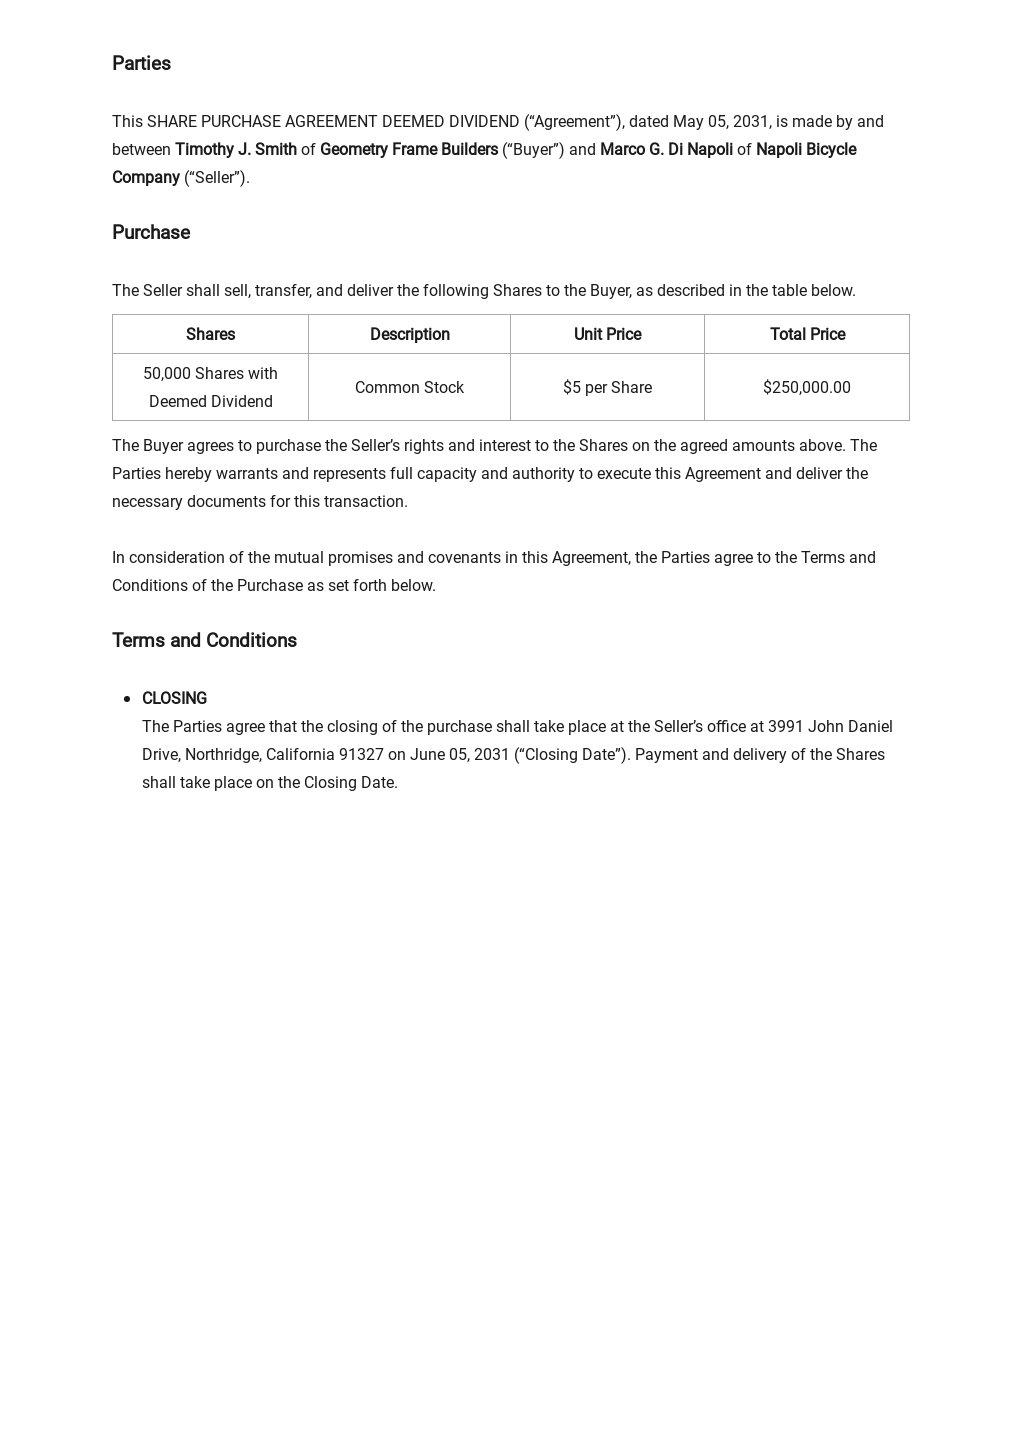 Share Purchase Agreement Deemed Dividend Template 1.jpe